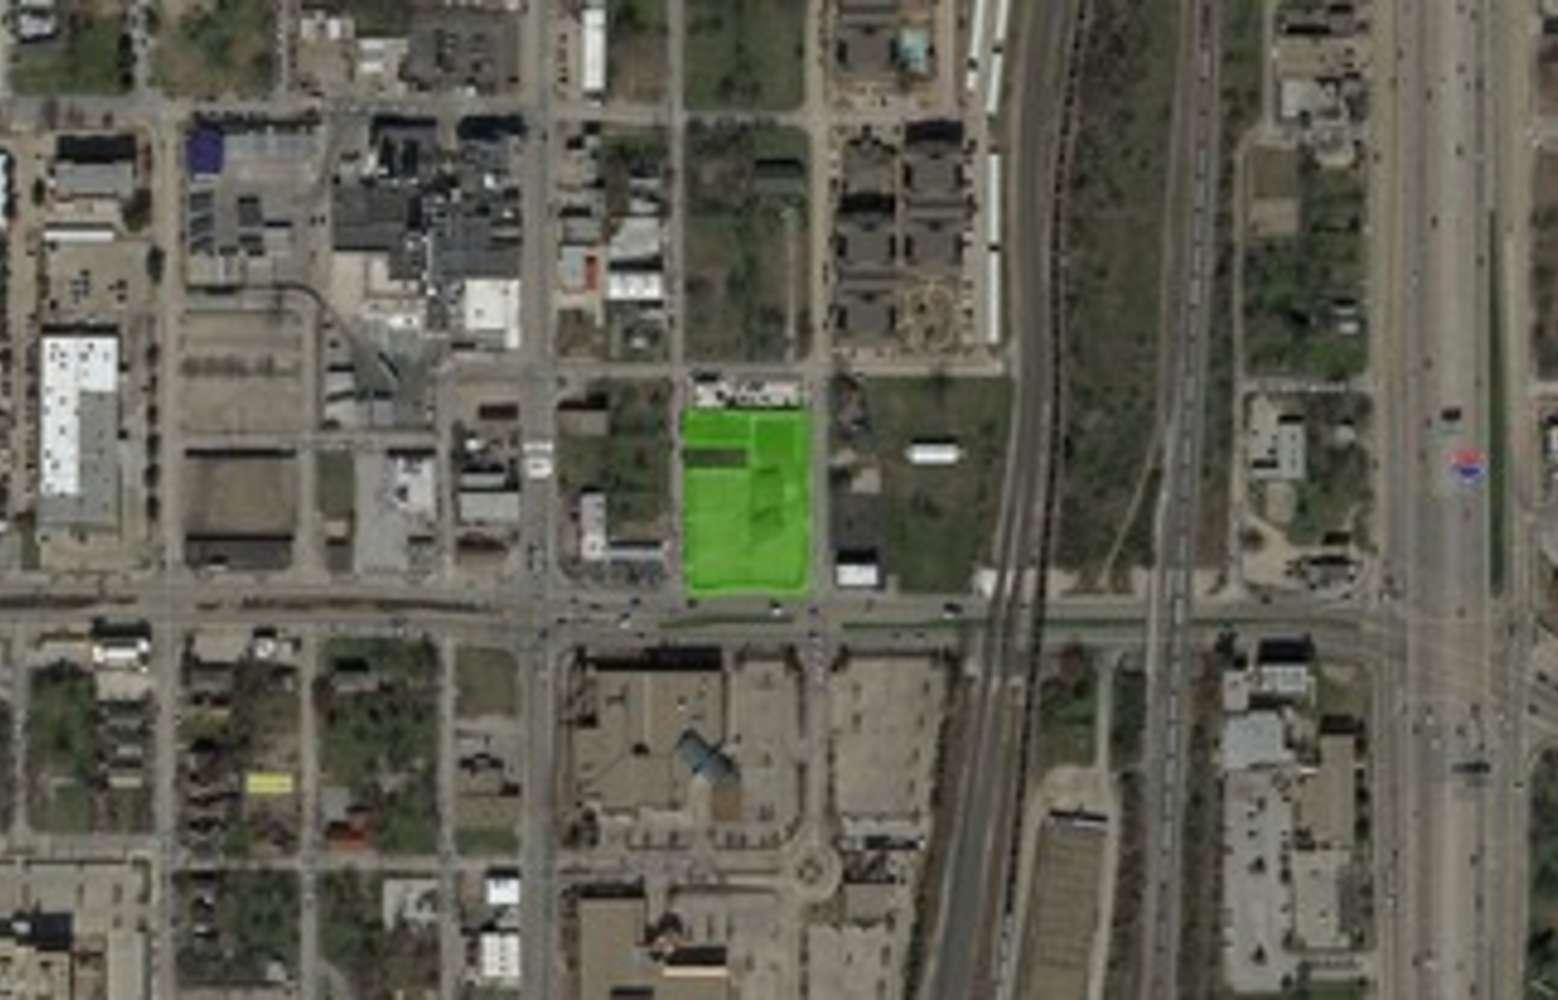 Land Fort worth, 76104 - 201-215 E Rosedale St